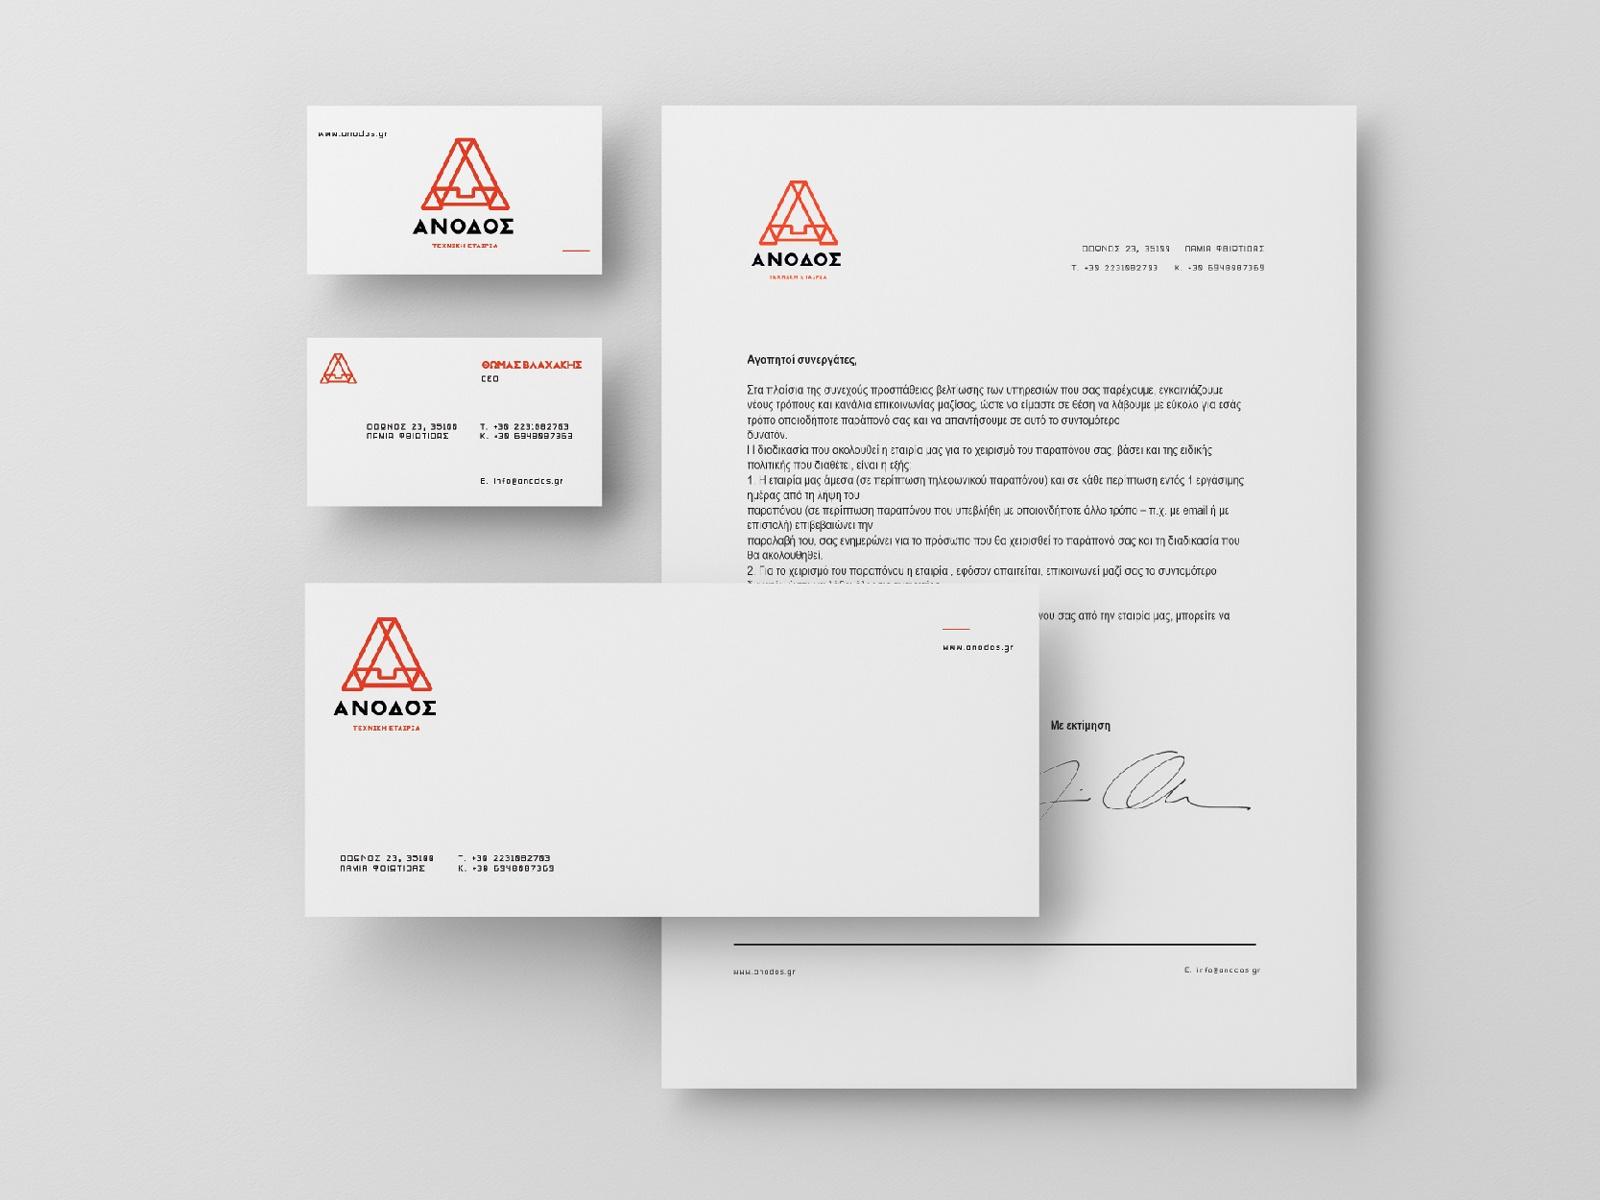 Anodos_Presentation-1_2-05